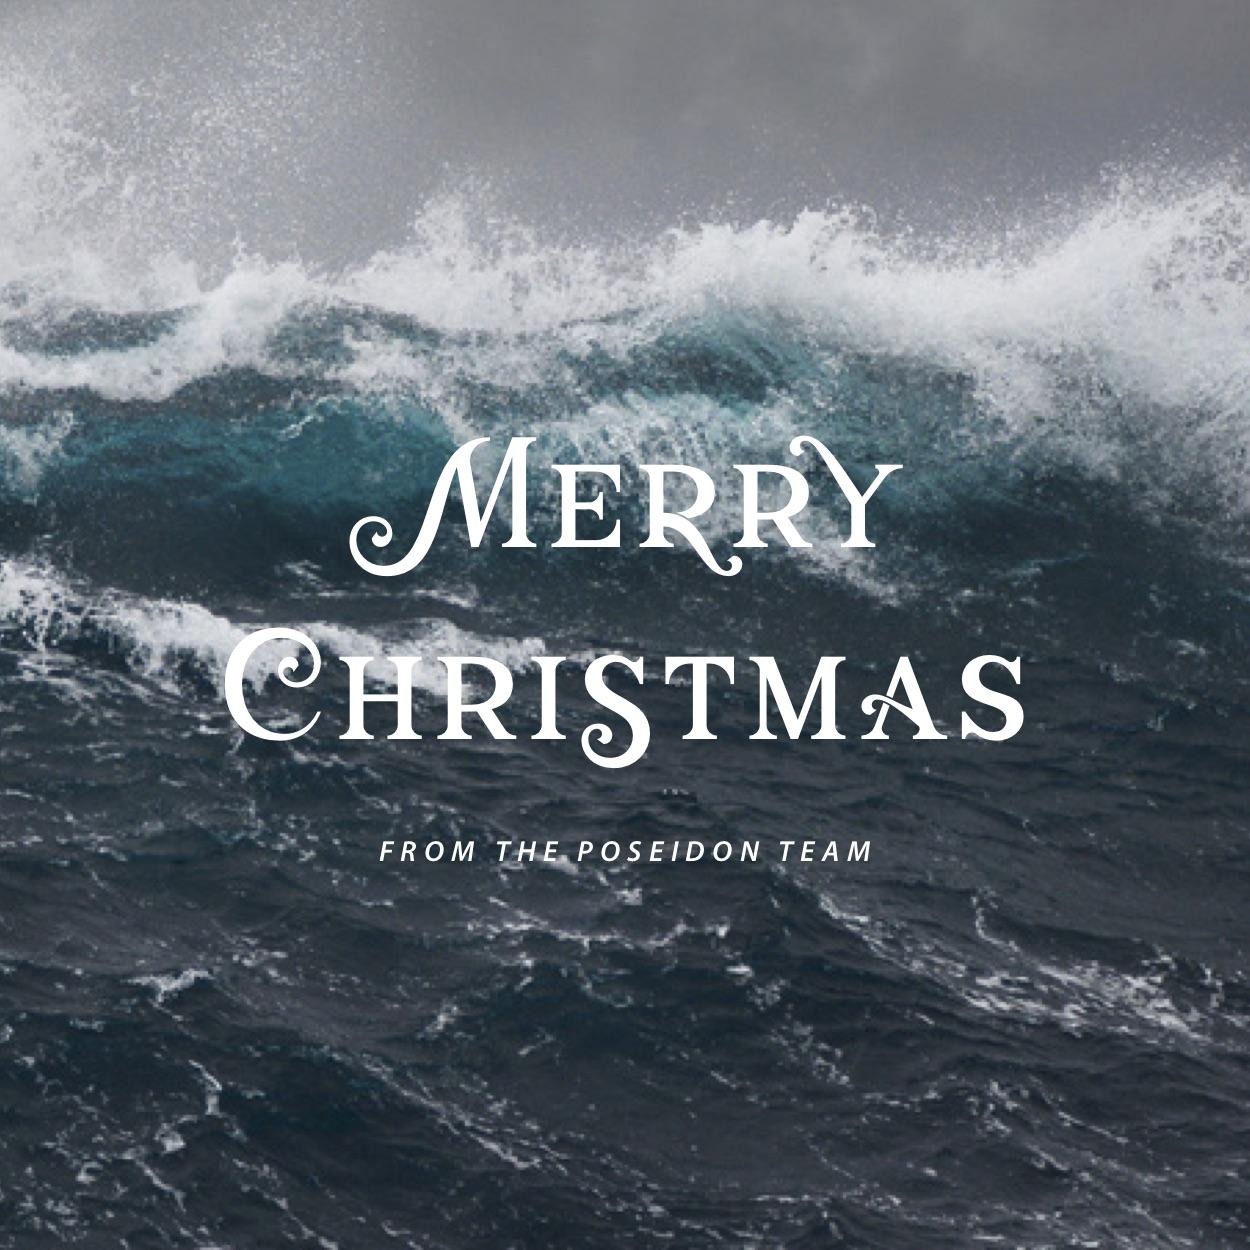 Merry_Christmas_Social.jpg